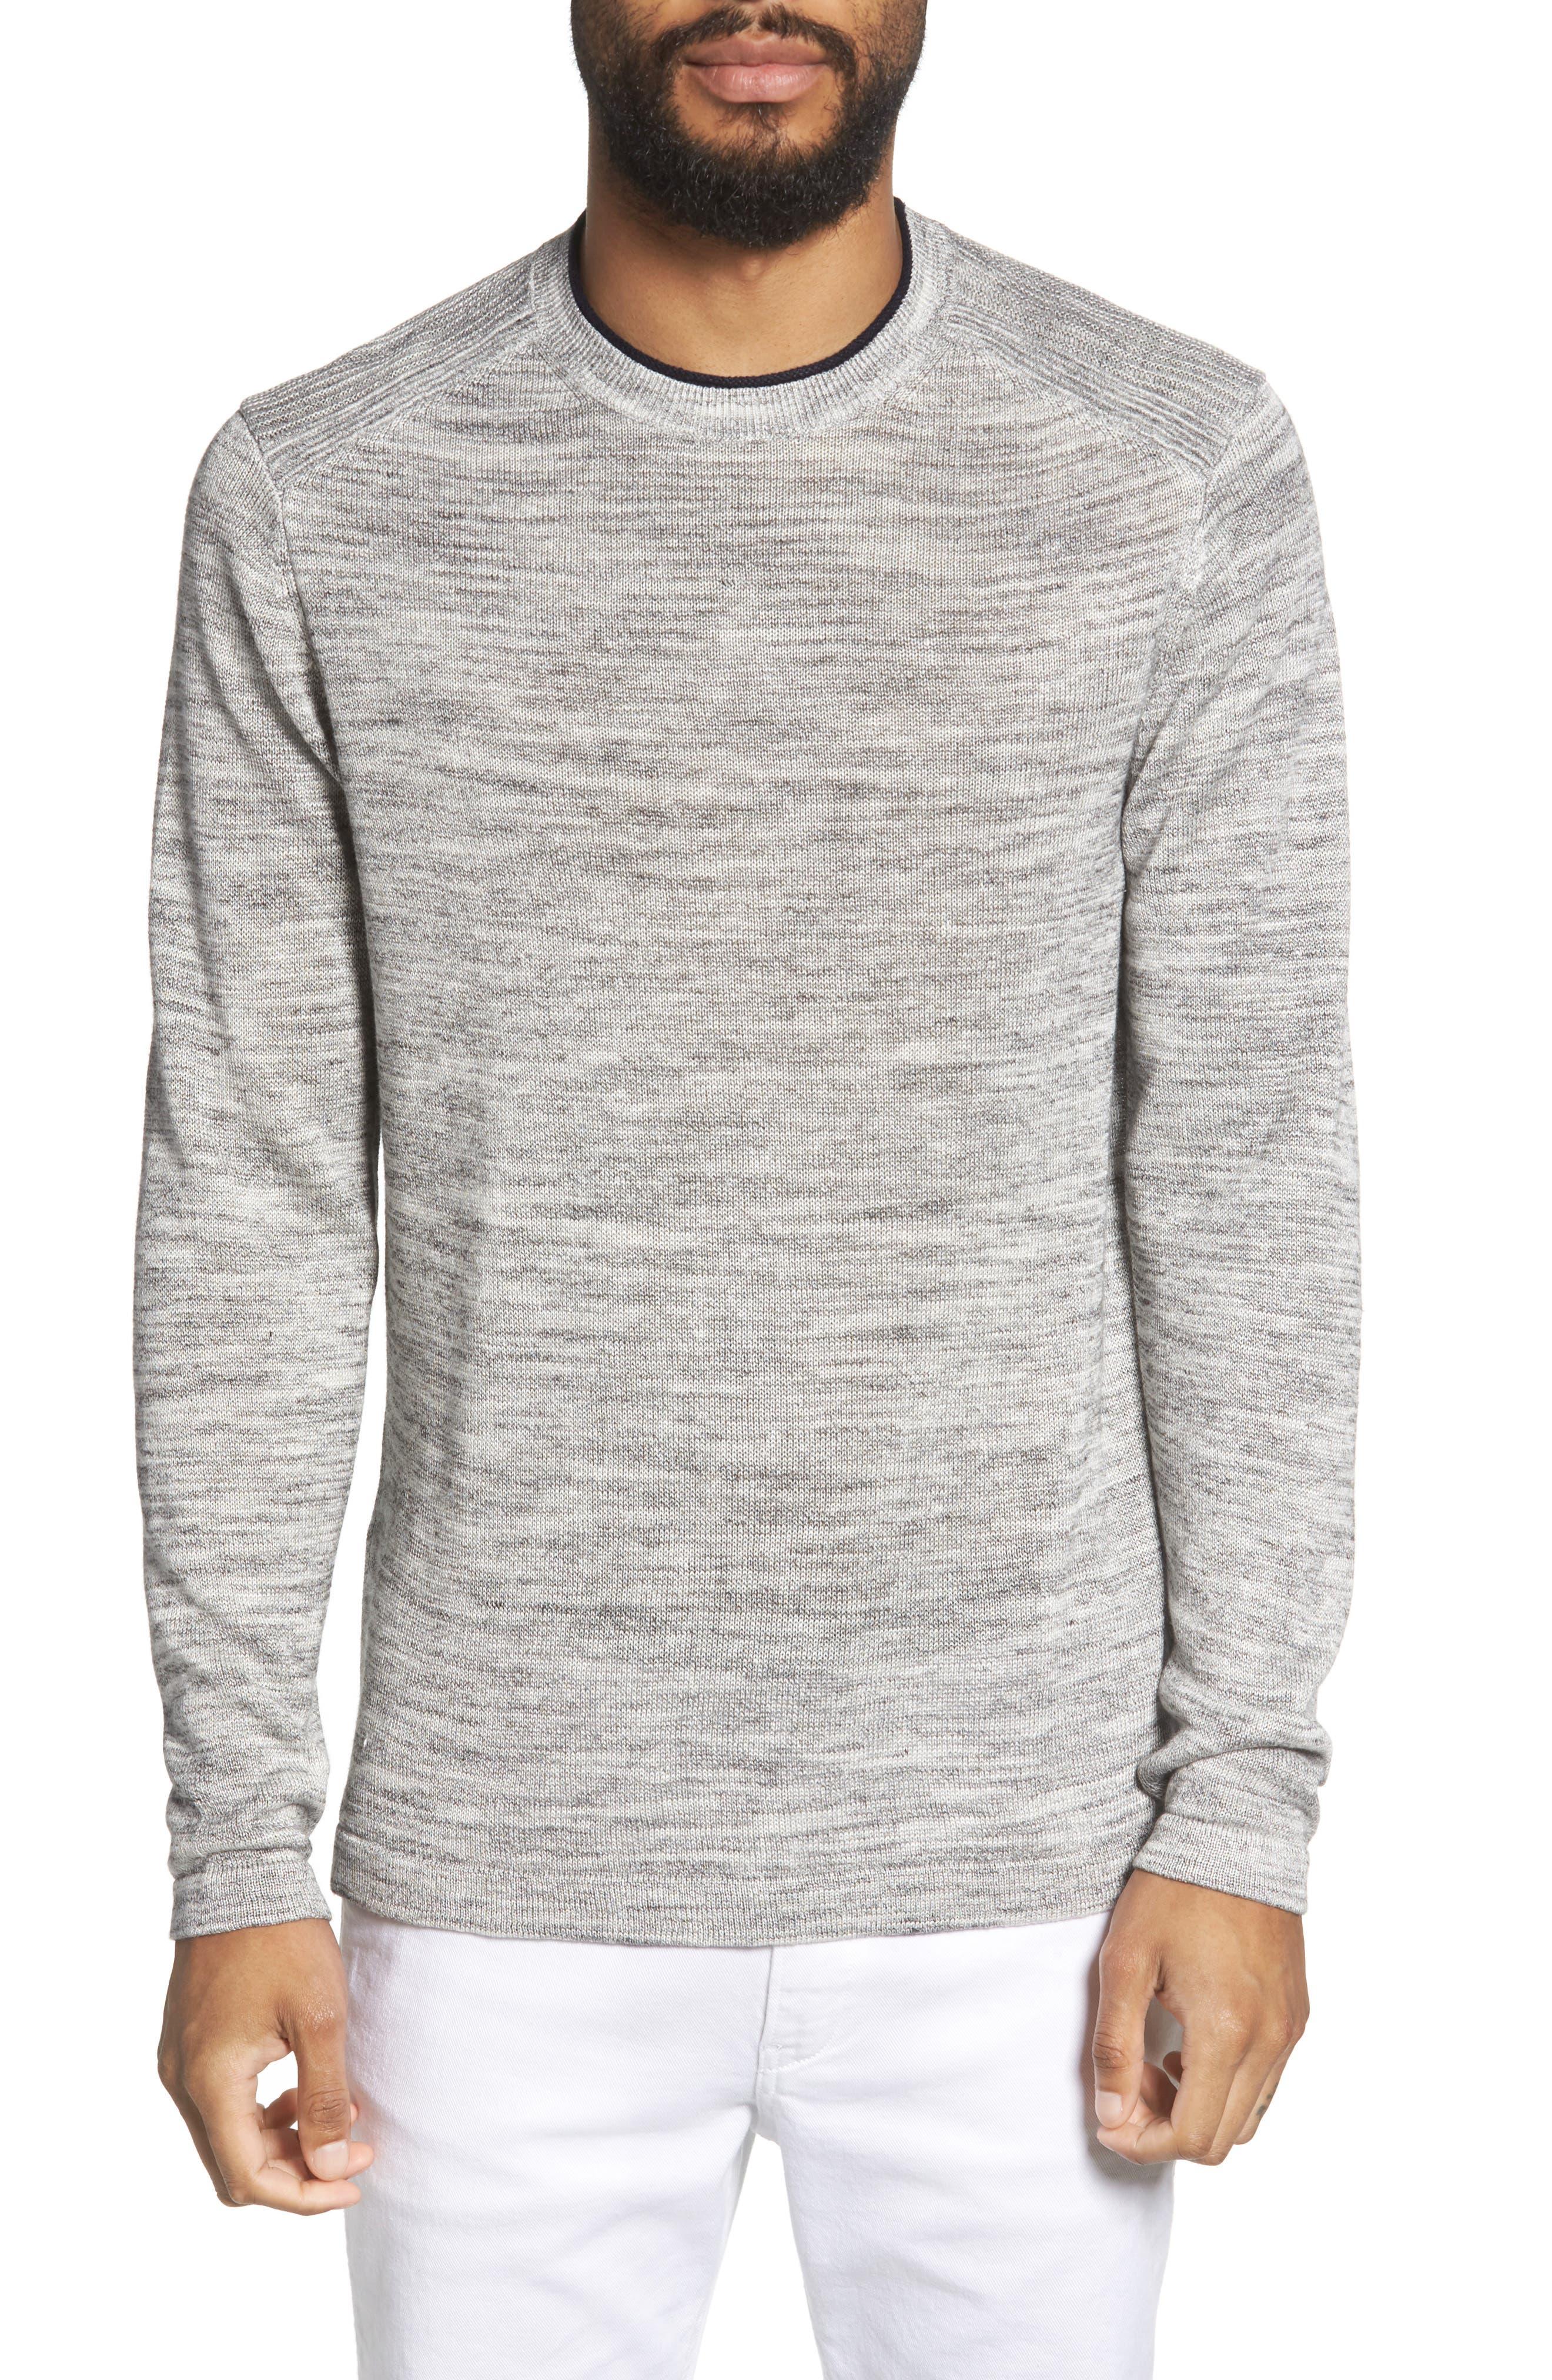 Inzone Crewneck Linen Blend Sweater,                             Main thumbnail 1, color,                             050